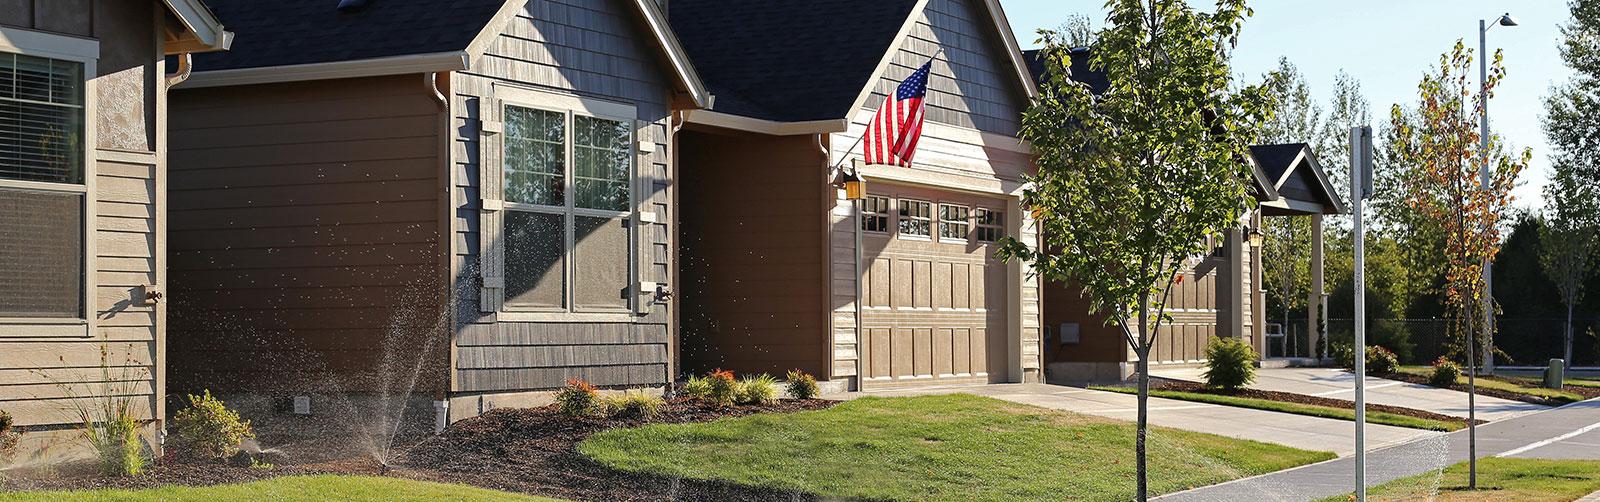 Realty Asset Management, Inc. Boise ID Property Management 208-387-0004